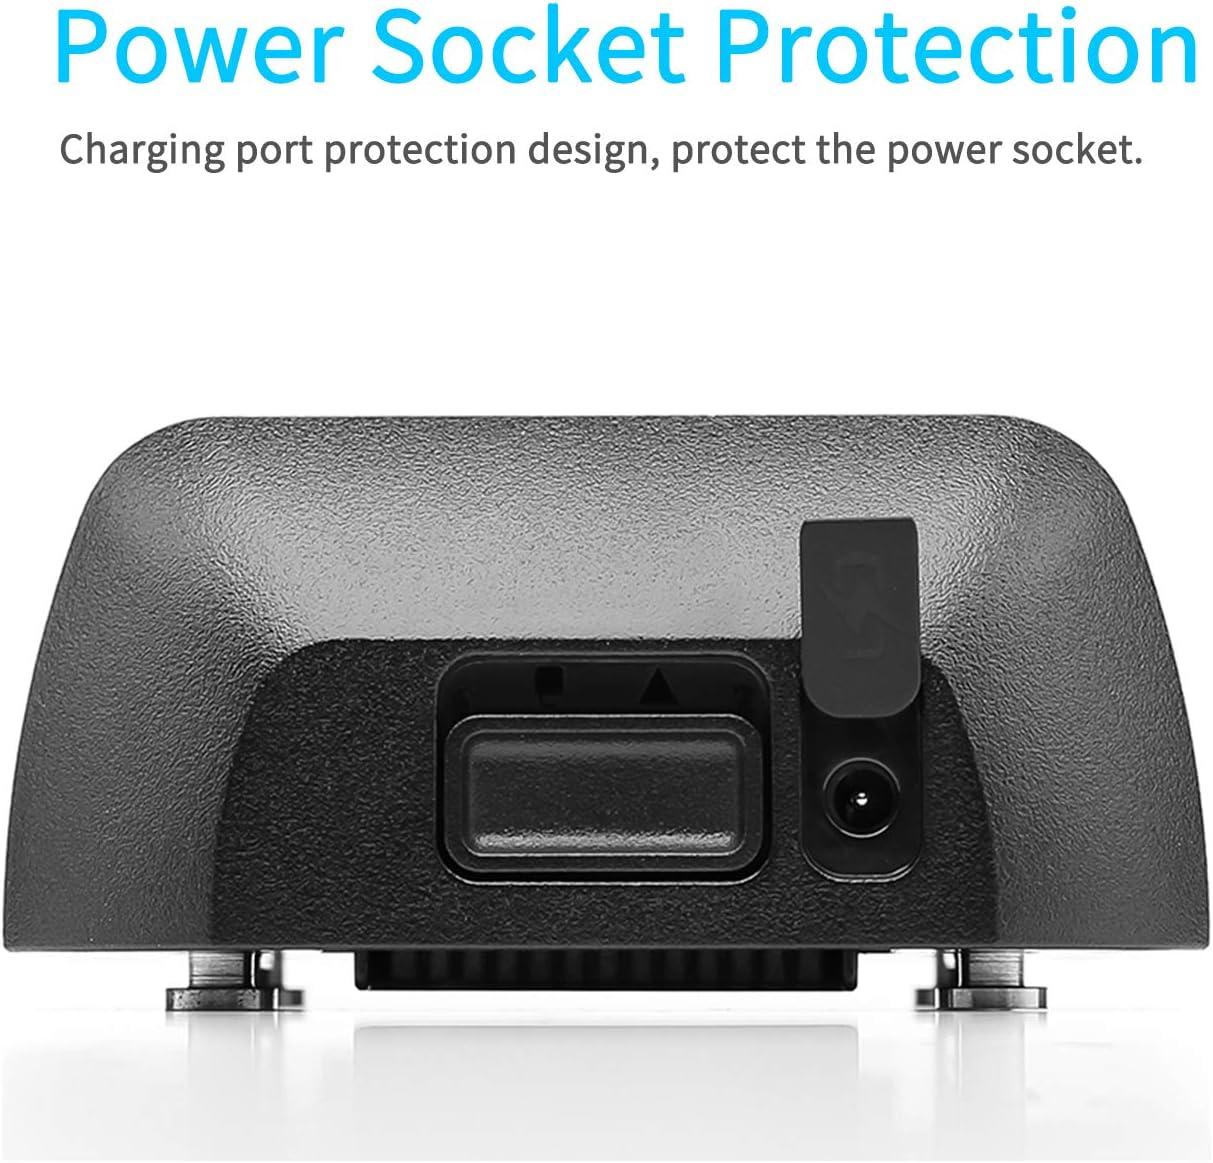 2600mAh Li-on Battery Pack for Godox AD400Pro Strobe Flash Godox WB400P Battery Replacement